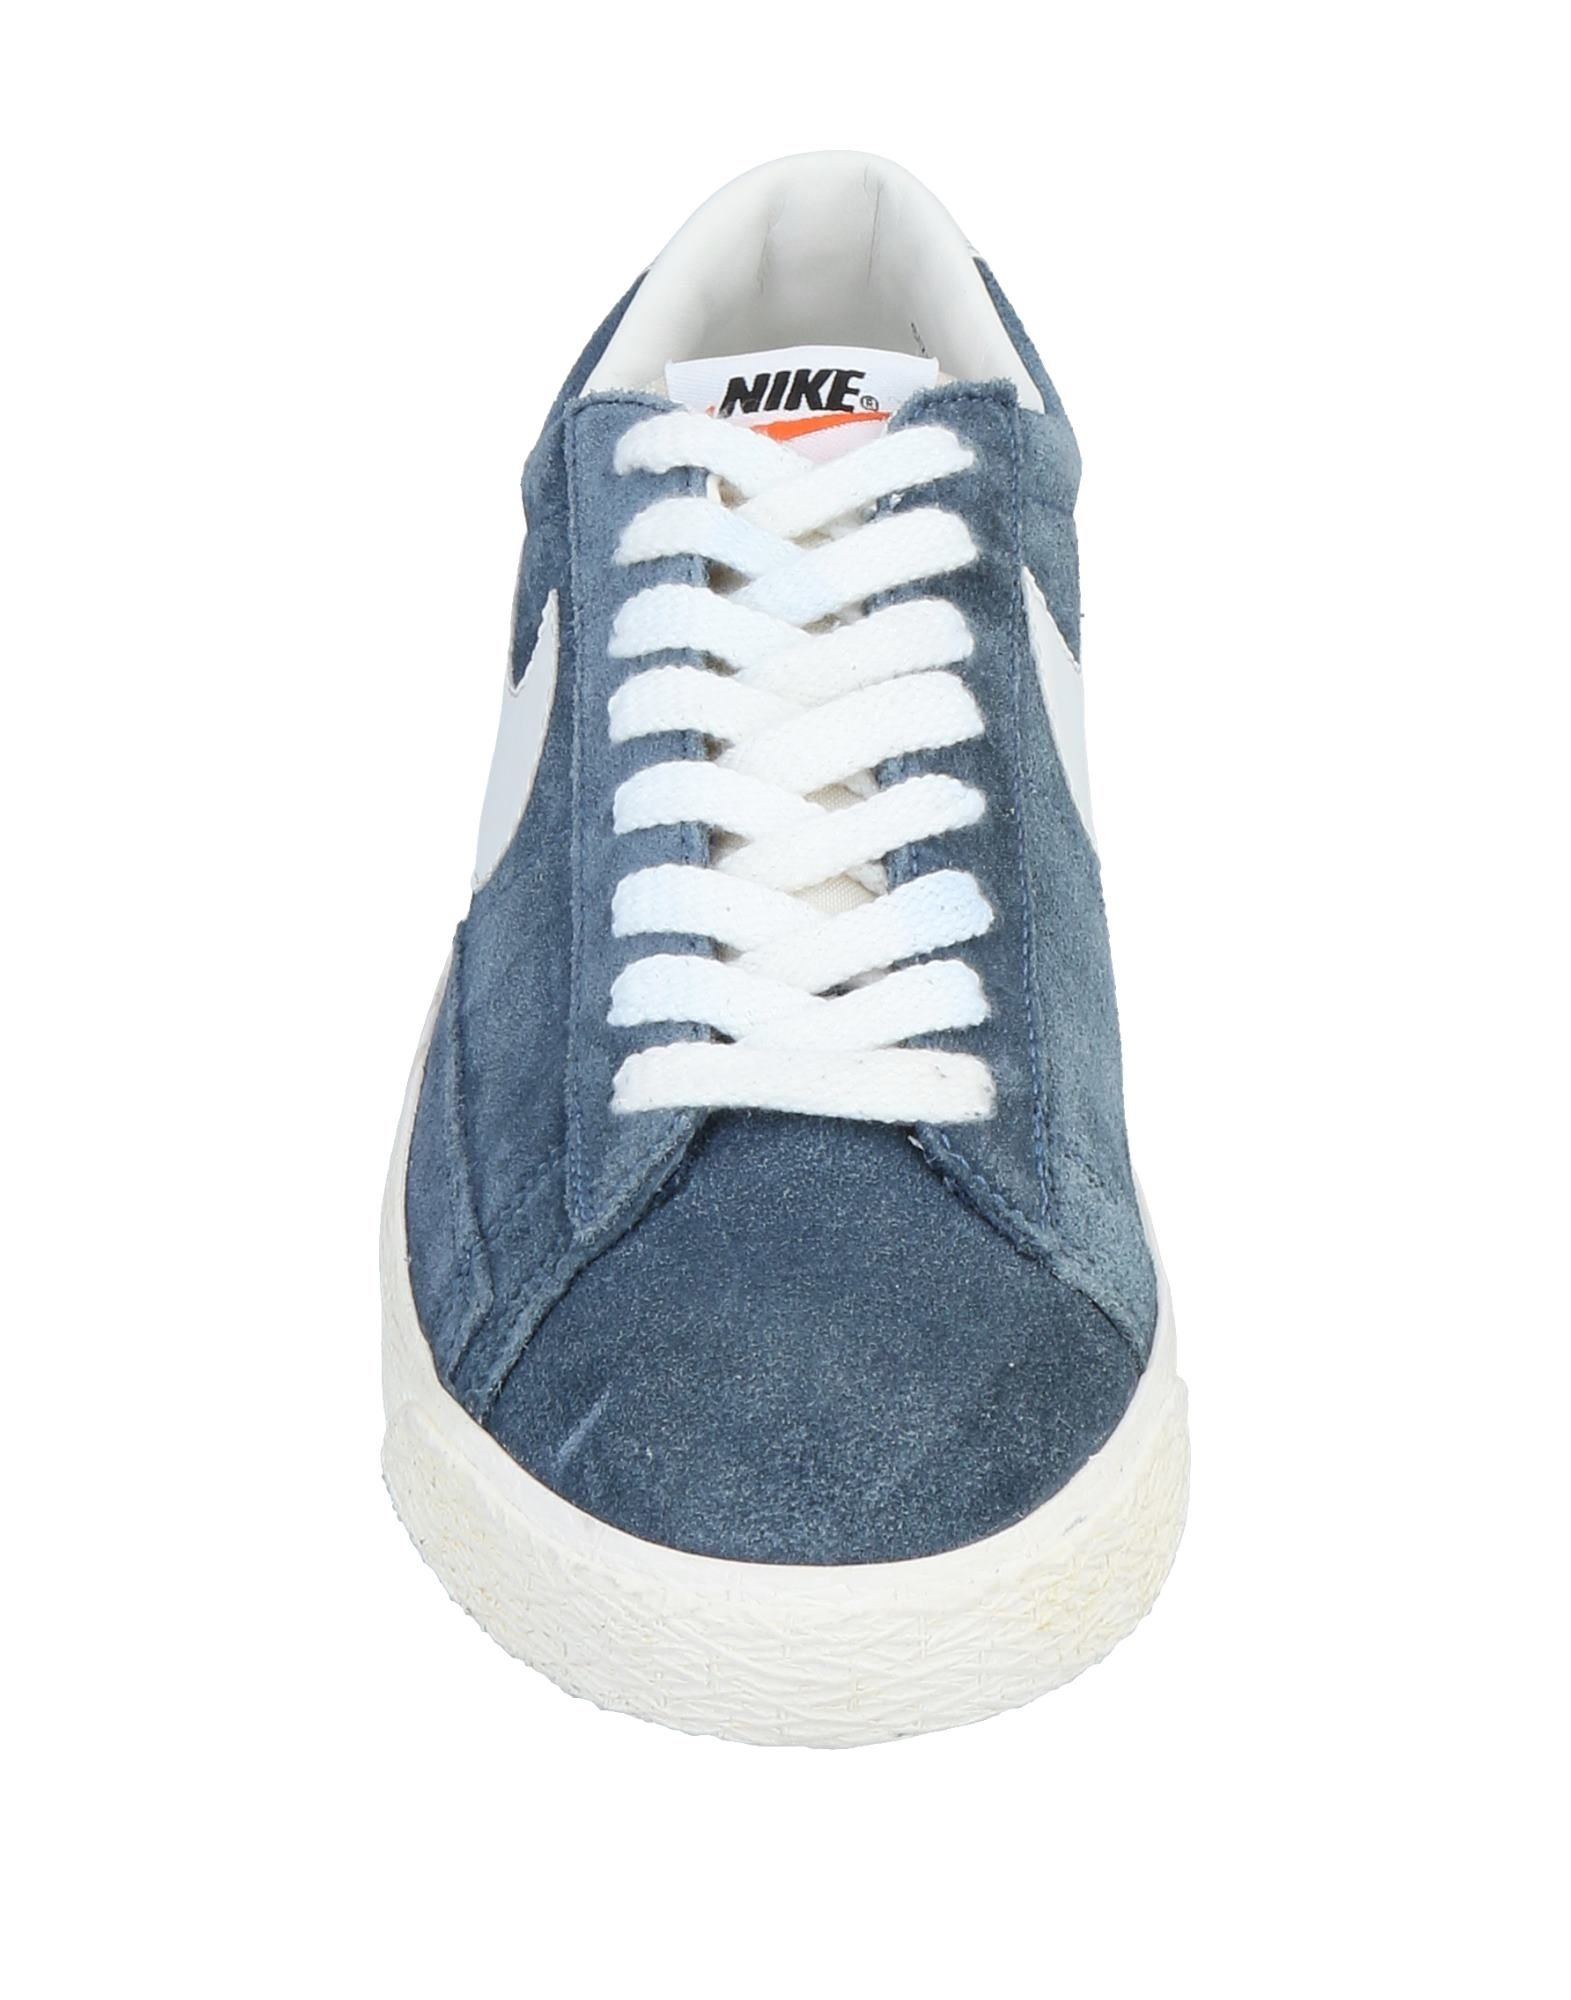 Nike Sneakers - Men Nike Sneakers online on  Australia Australia Australia - 11572883XG 4e8d7a